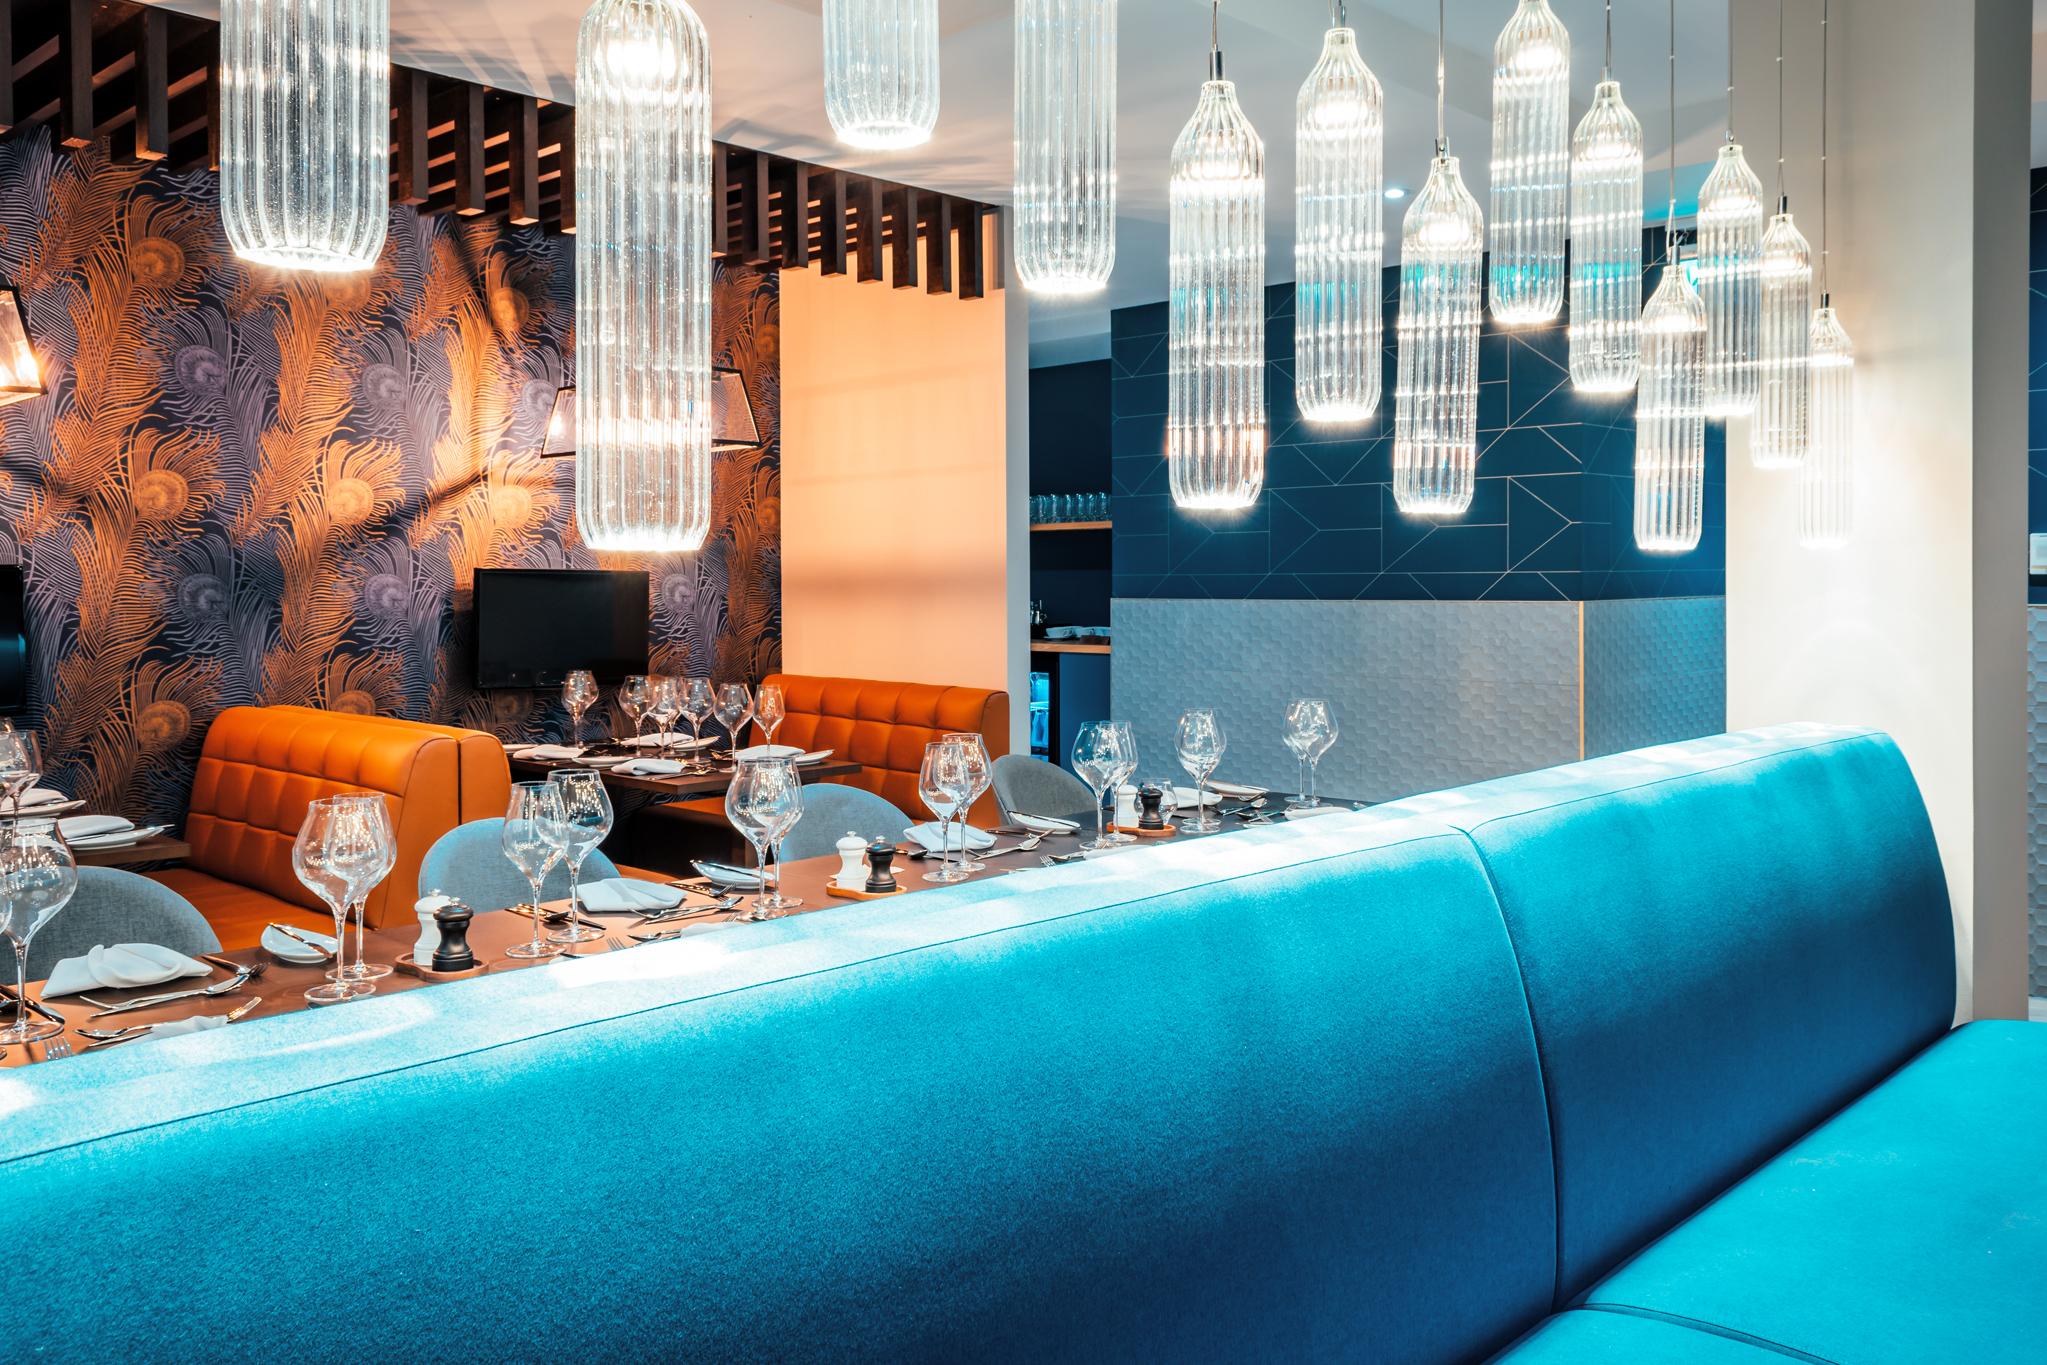 Restaurant Colour Scheme Affects Restaurant Ambience